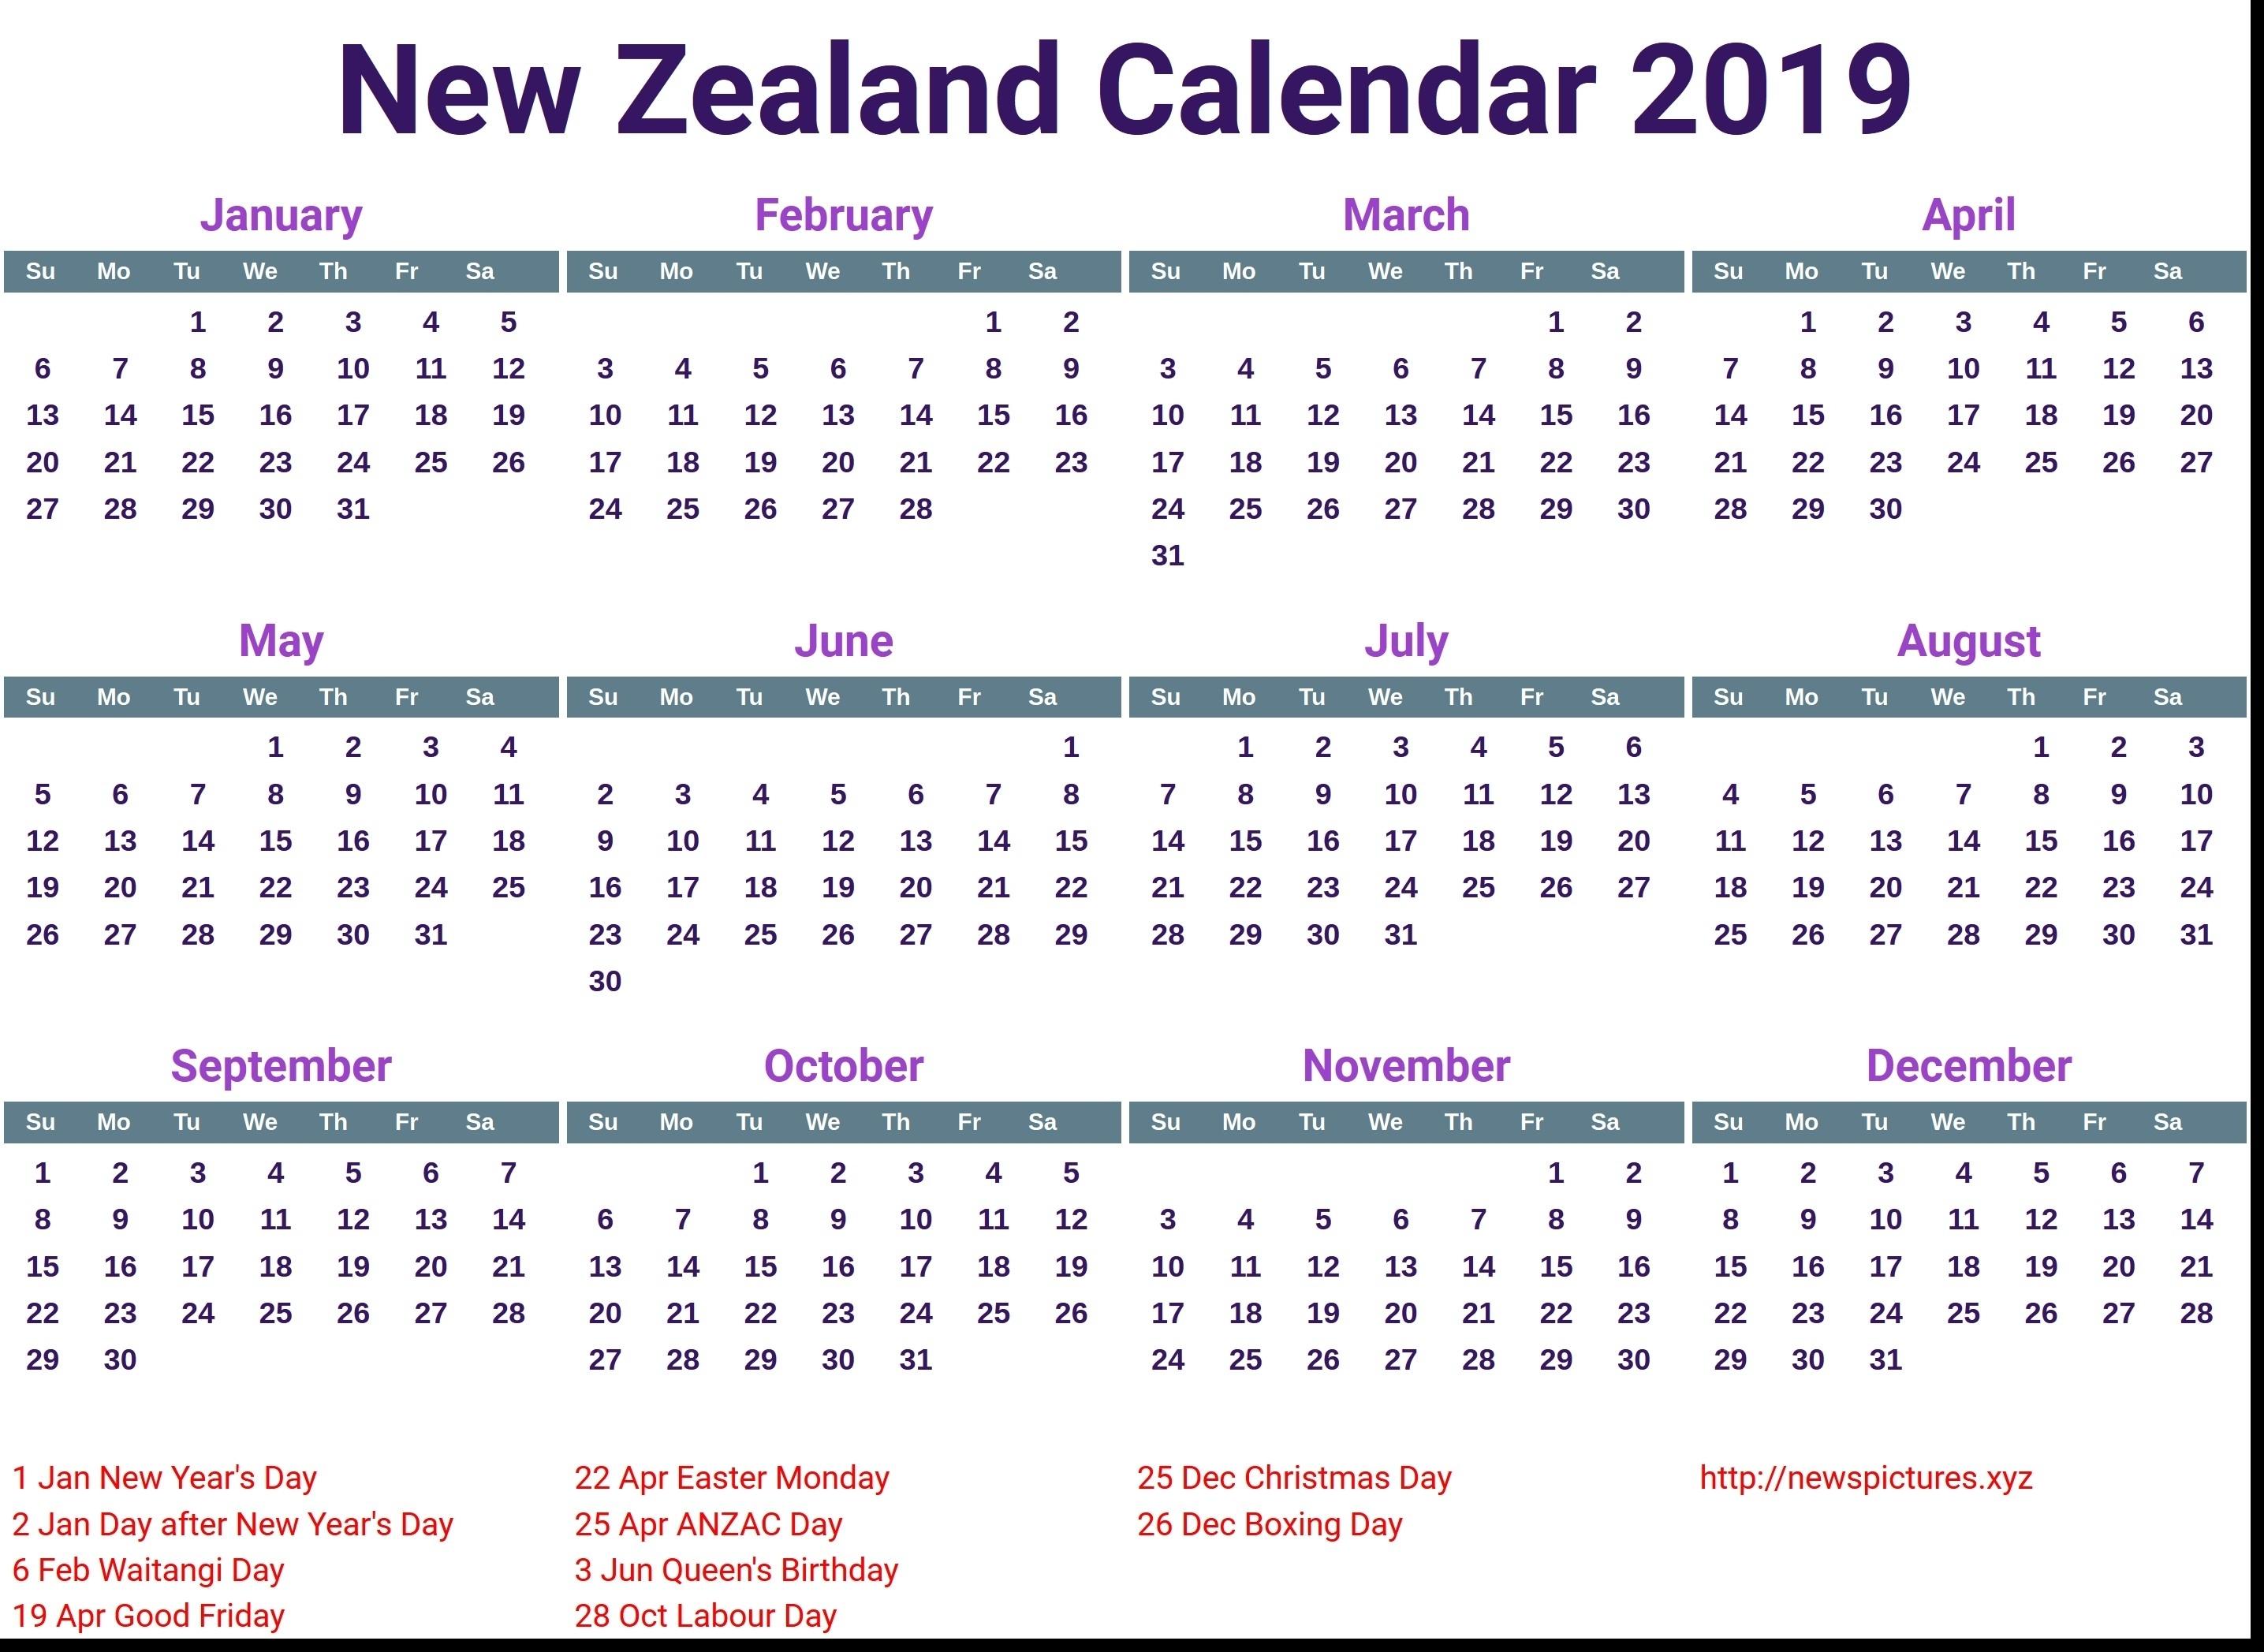 February 2020 Calendar Nz - Cerno.mioduchowski